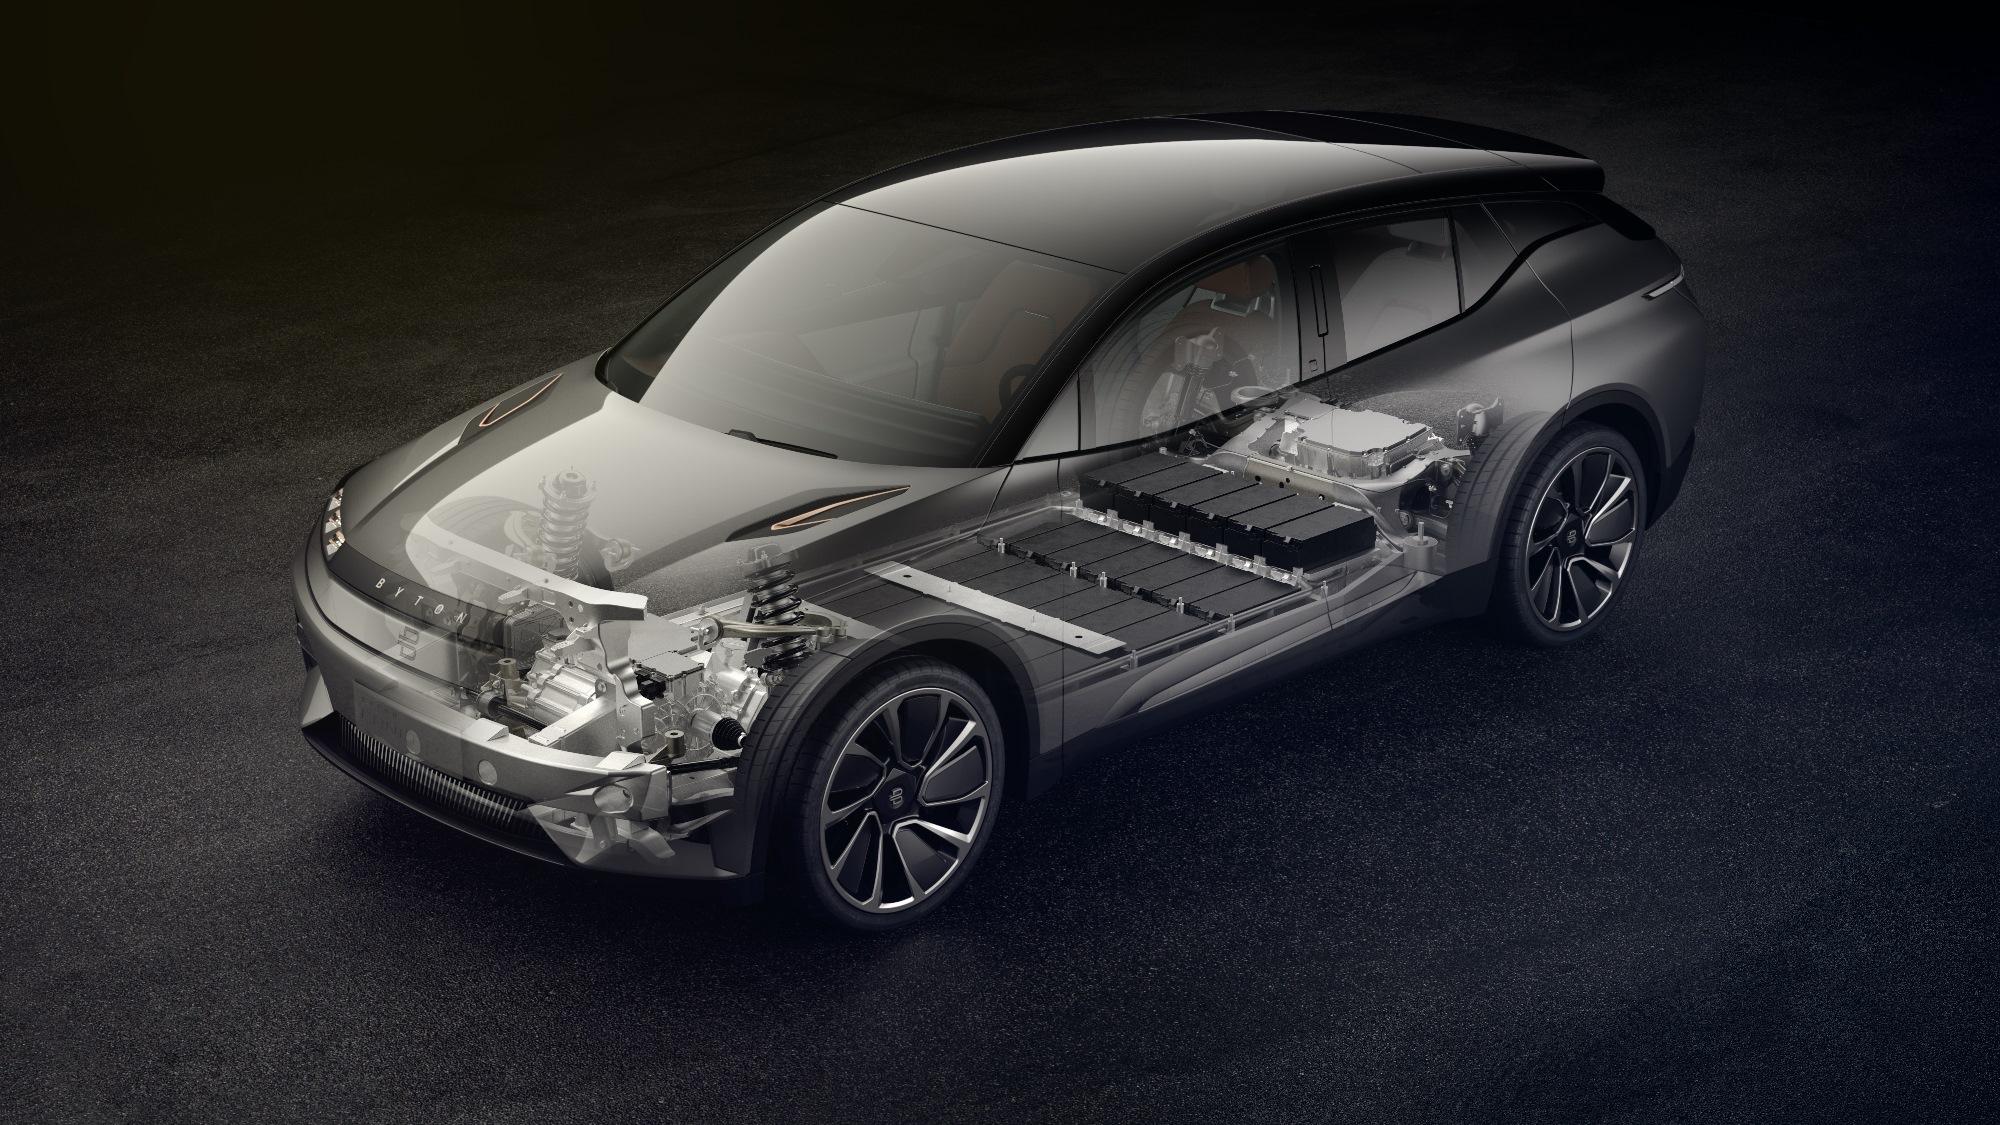 Byton concept vehicle powertrain